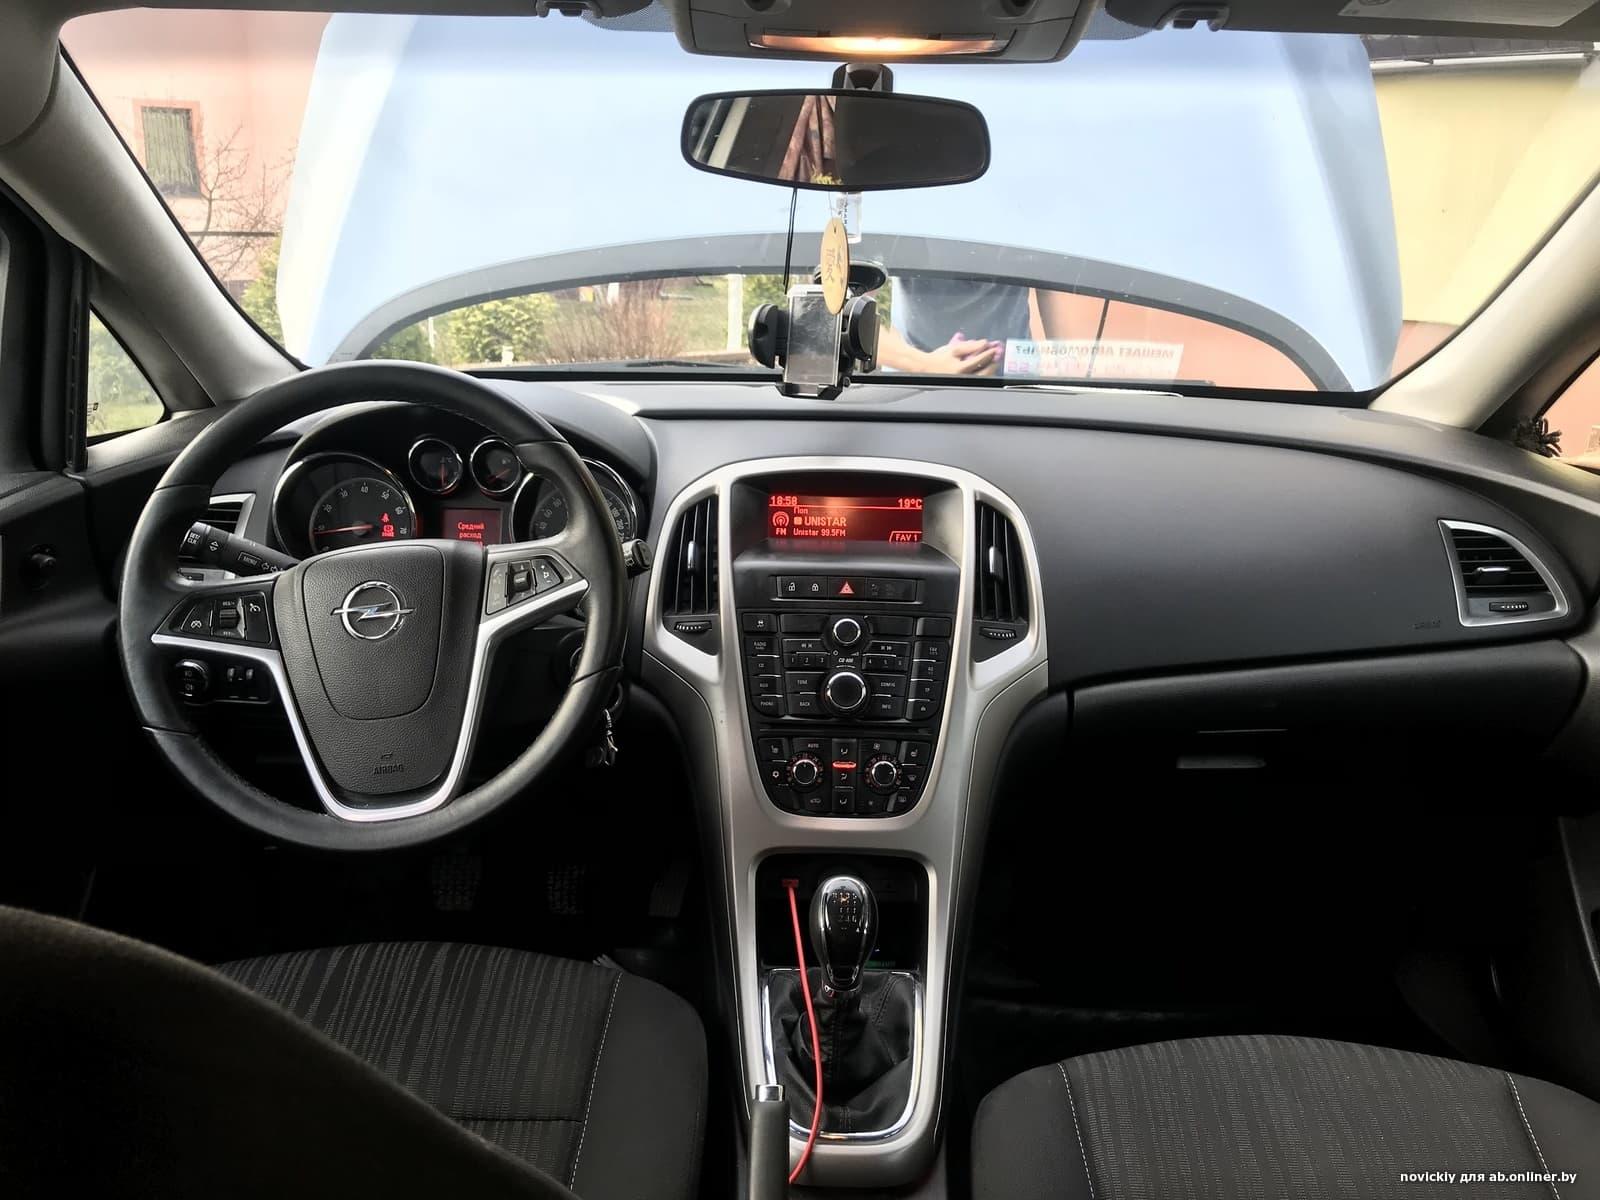 Opel Astra Turbo 140 лс